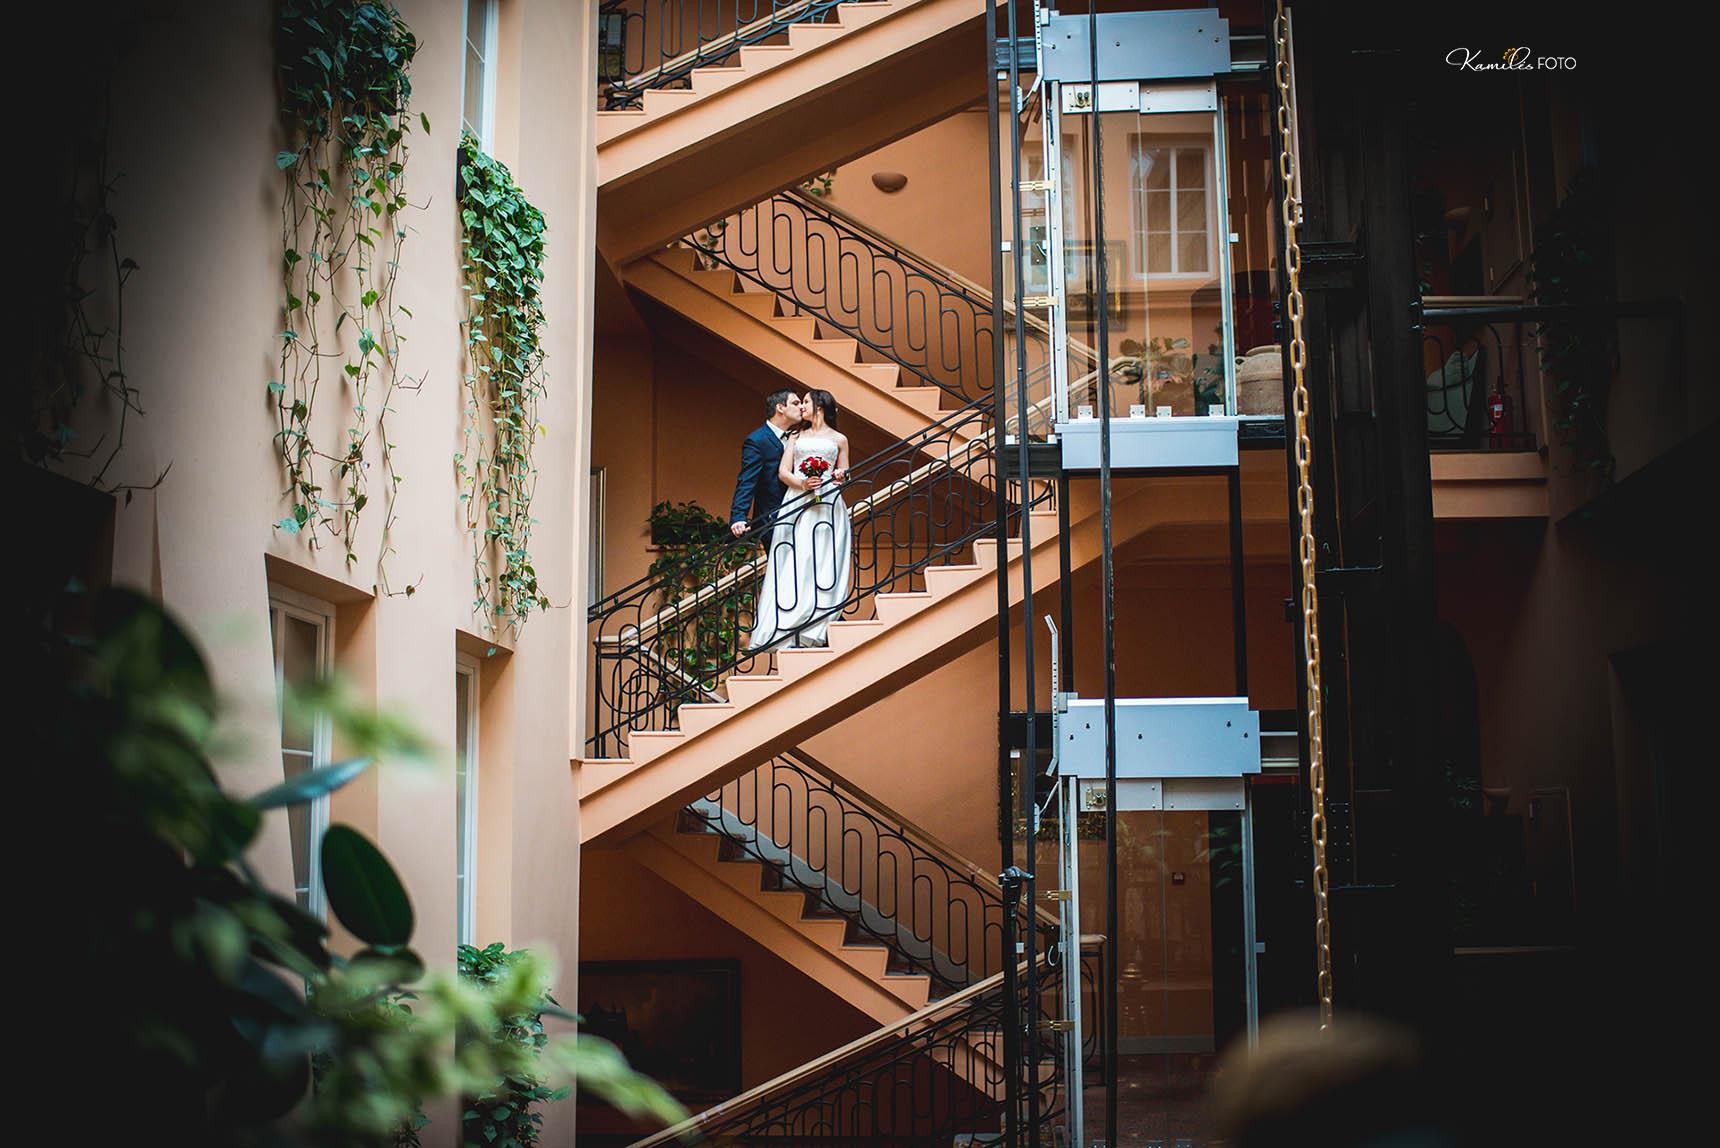 vestuvių fotografai Vilniuje, vestuvių fotografai palangoje, vestuviu fotografai kaune, vestuviu fotografai panevezyje